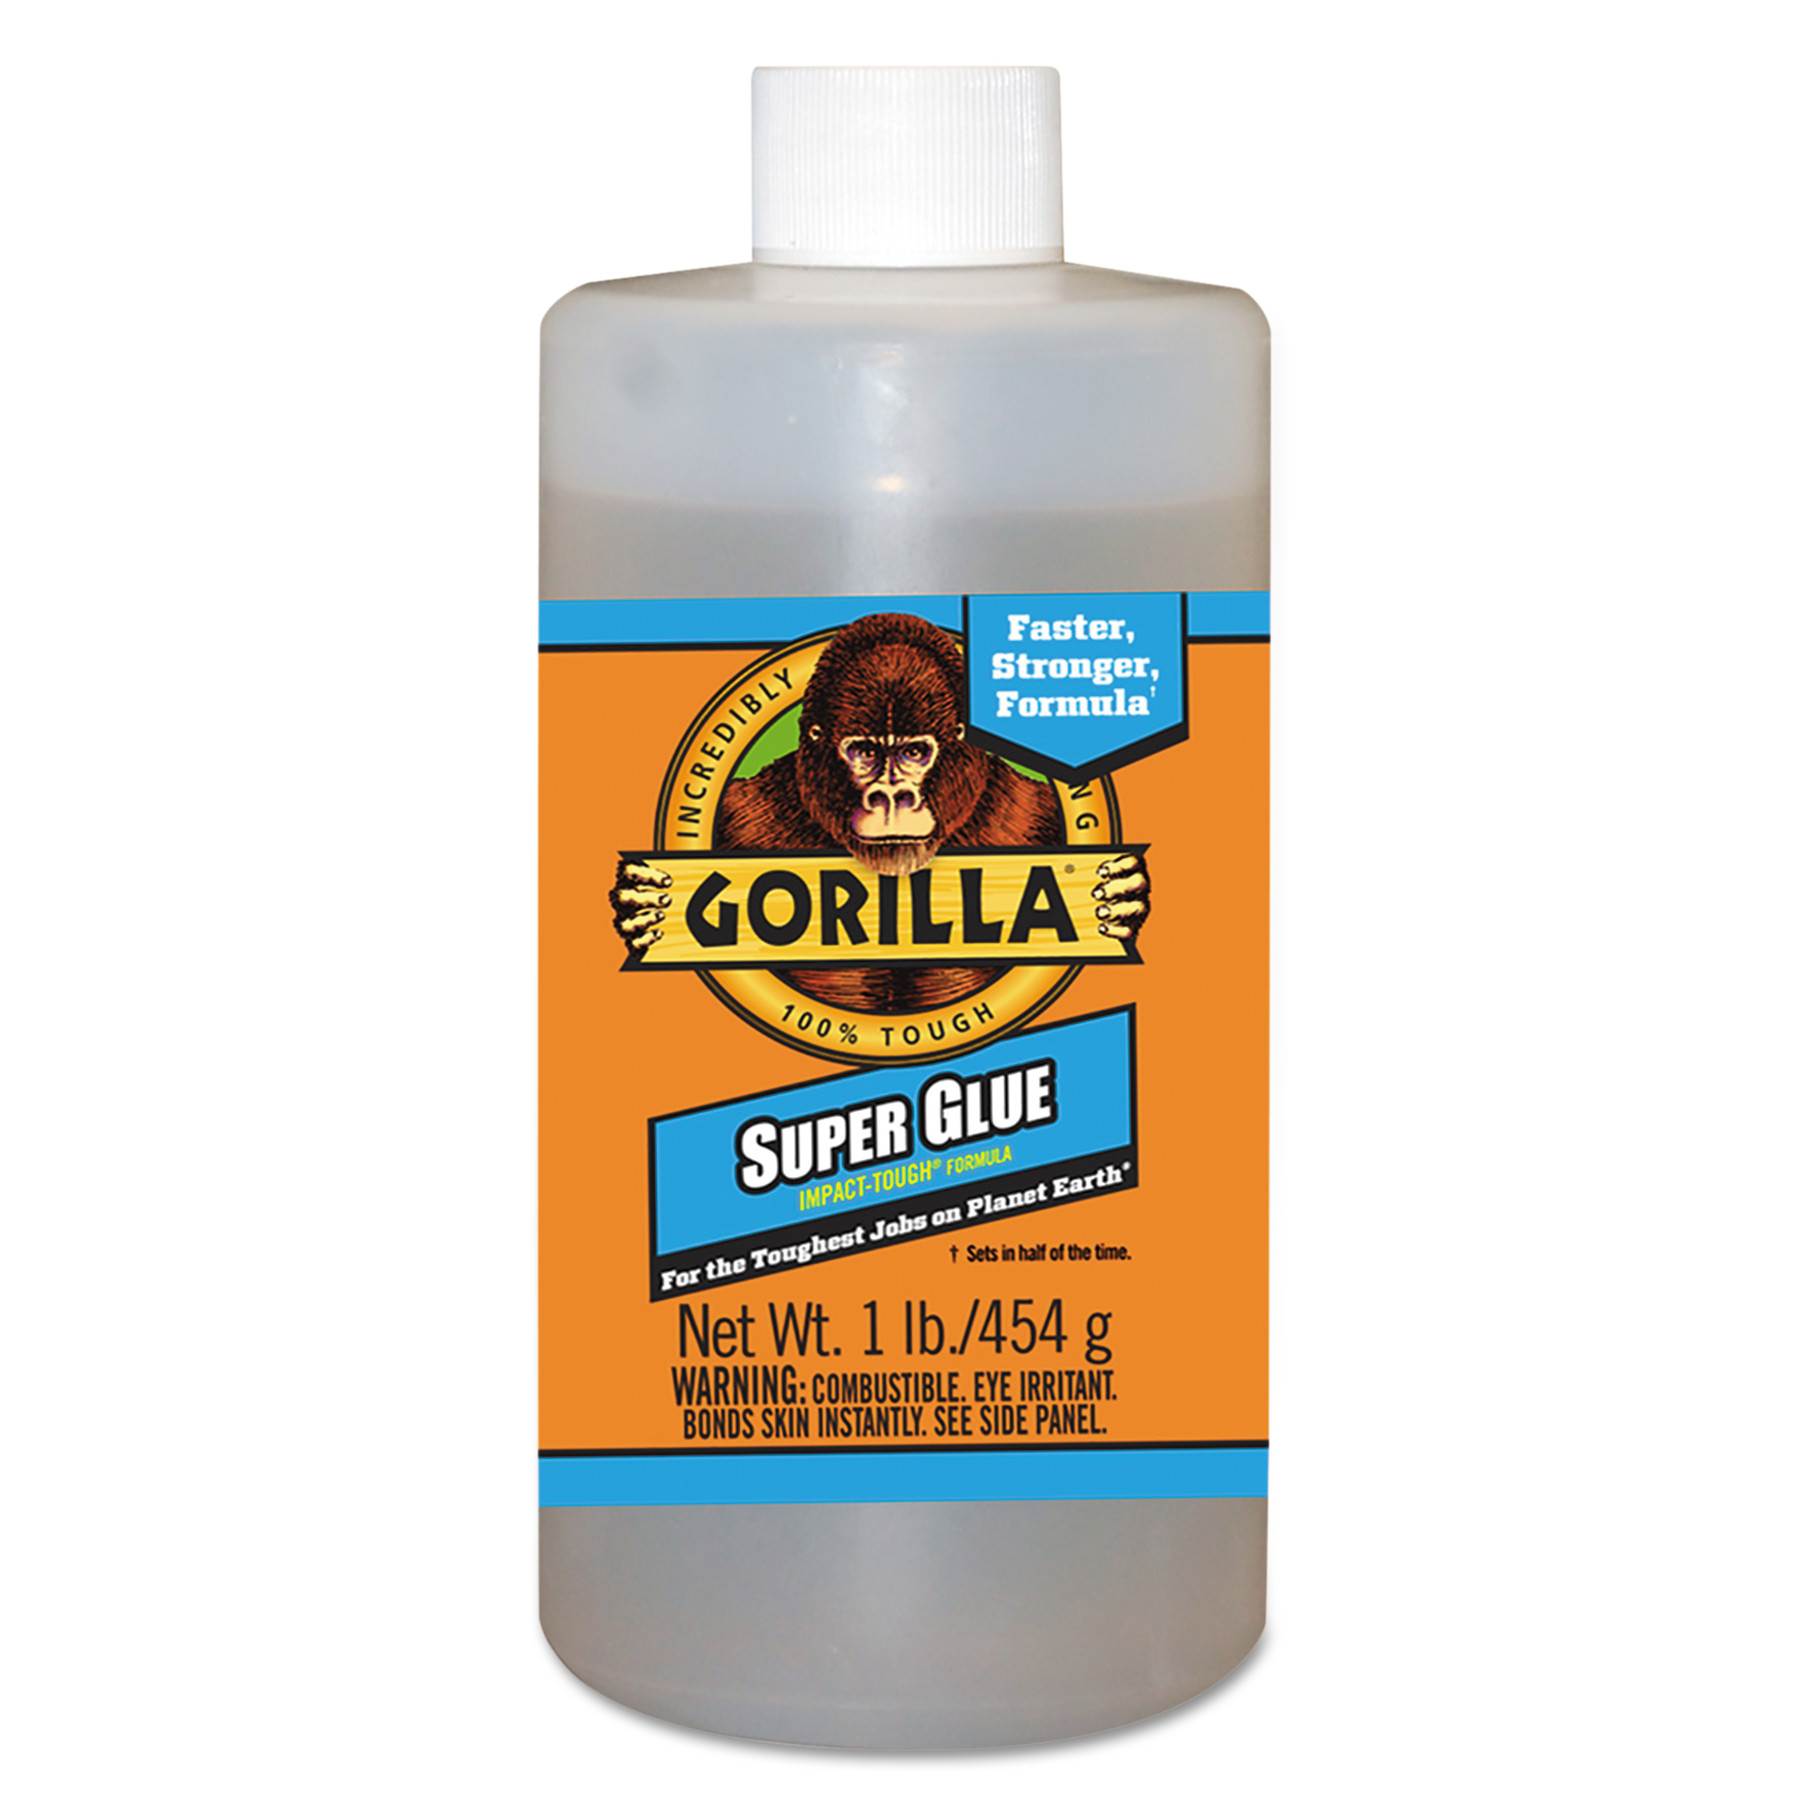 Gorilla Glue Instant Bond Superglue, 1 lb Bottle, Clear by GORILLA GLUE COMPANY